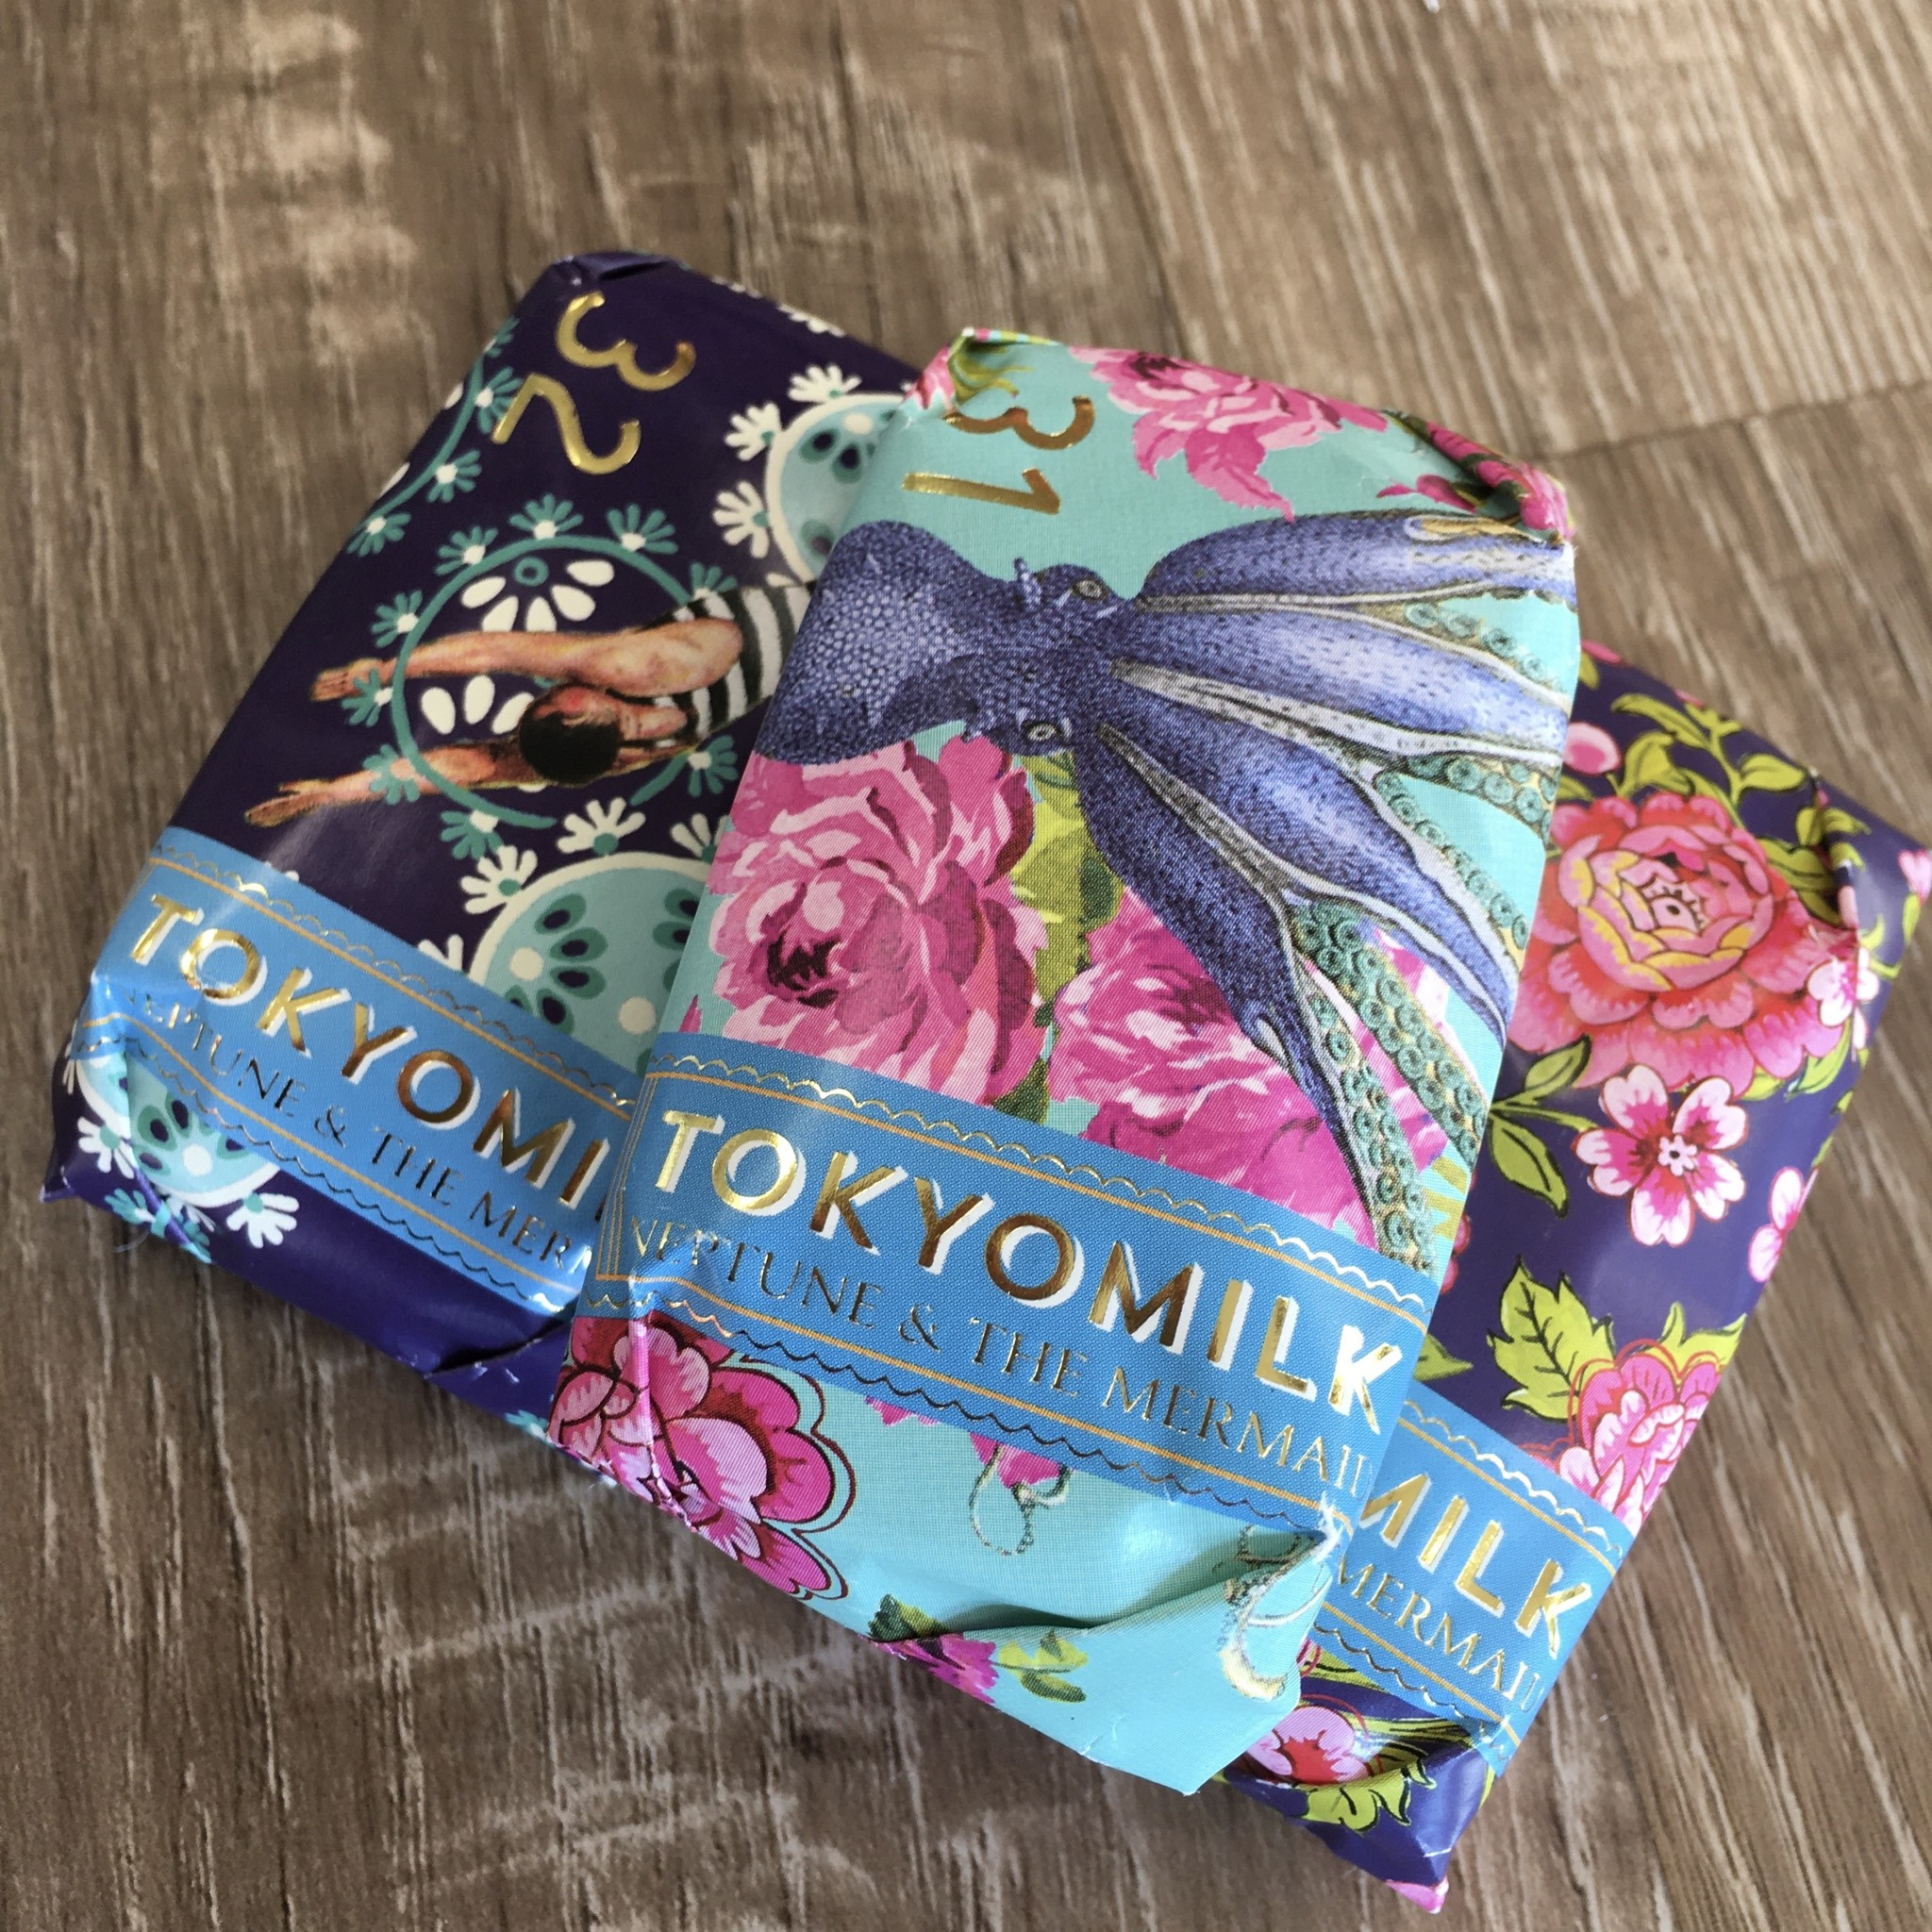 TokyoMilk Lost Atlantis Mini Soap Collection